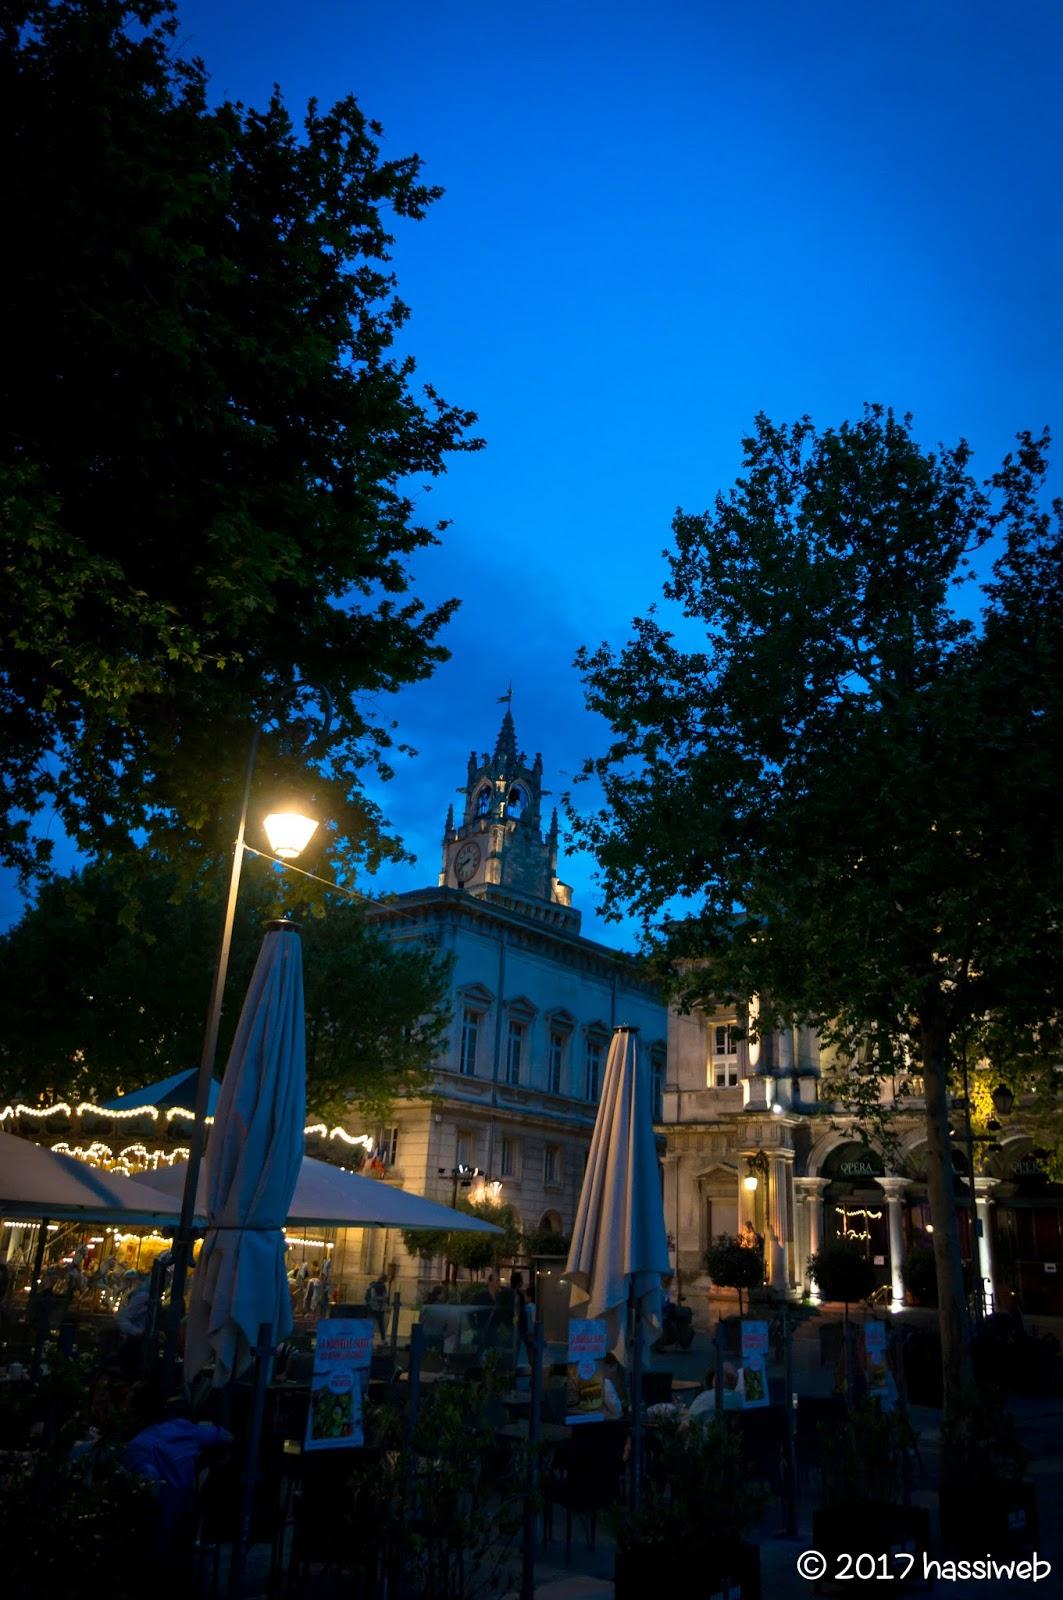 時計台広場 (Place de l'Horloge)